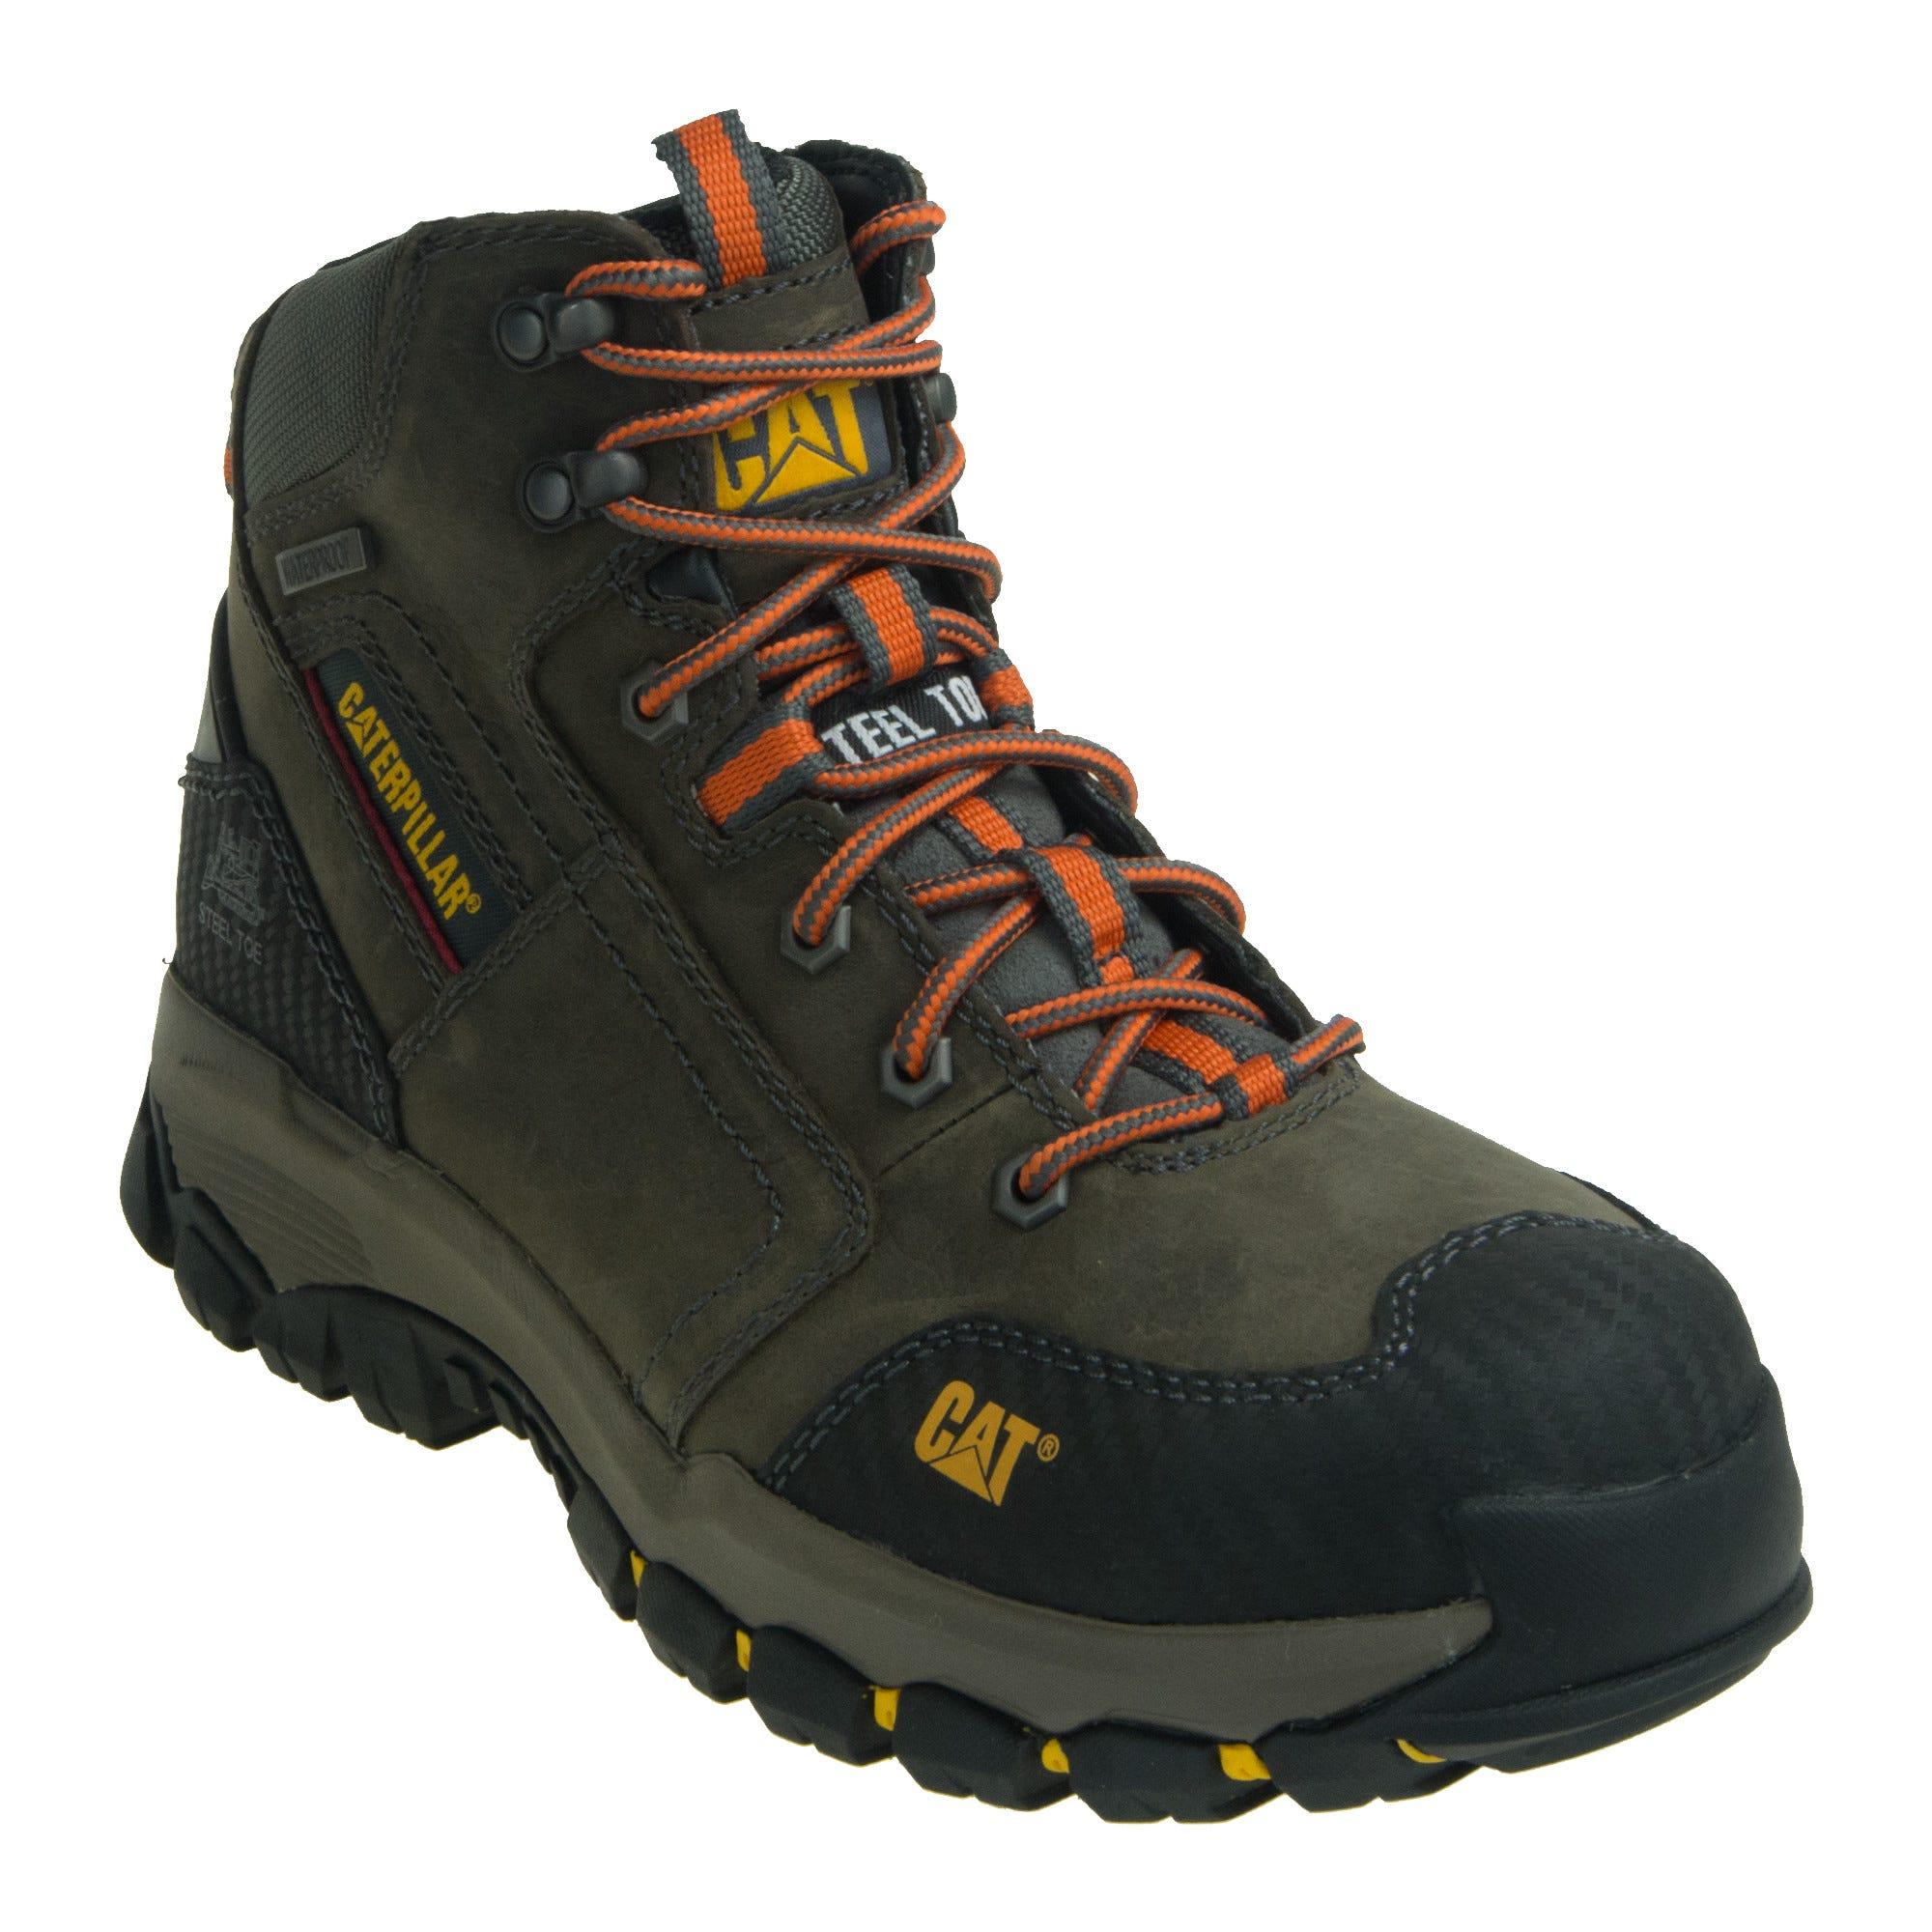 1c1d1f23c8d Caterpillar Men's Boots | MenStyle USA